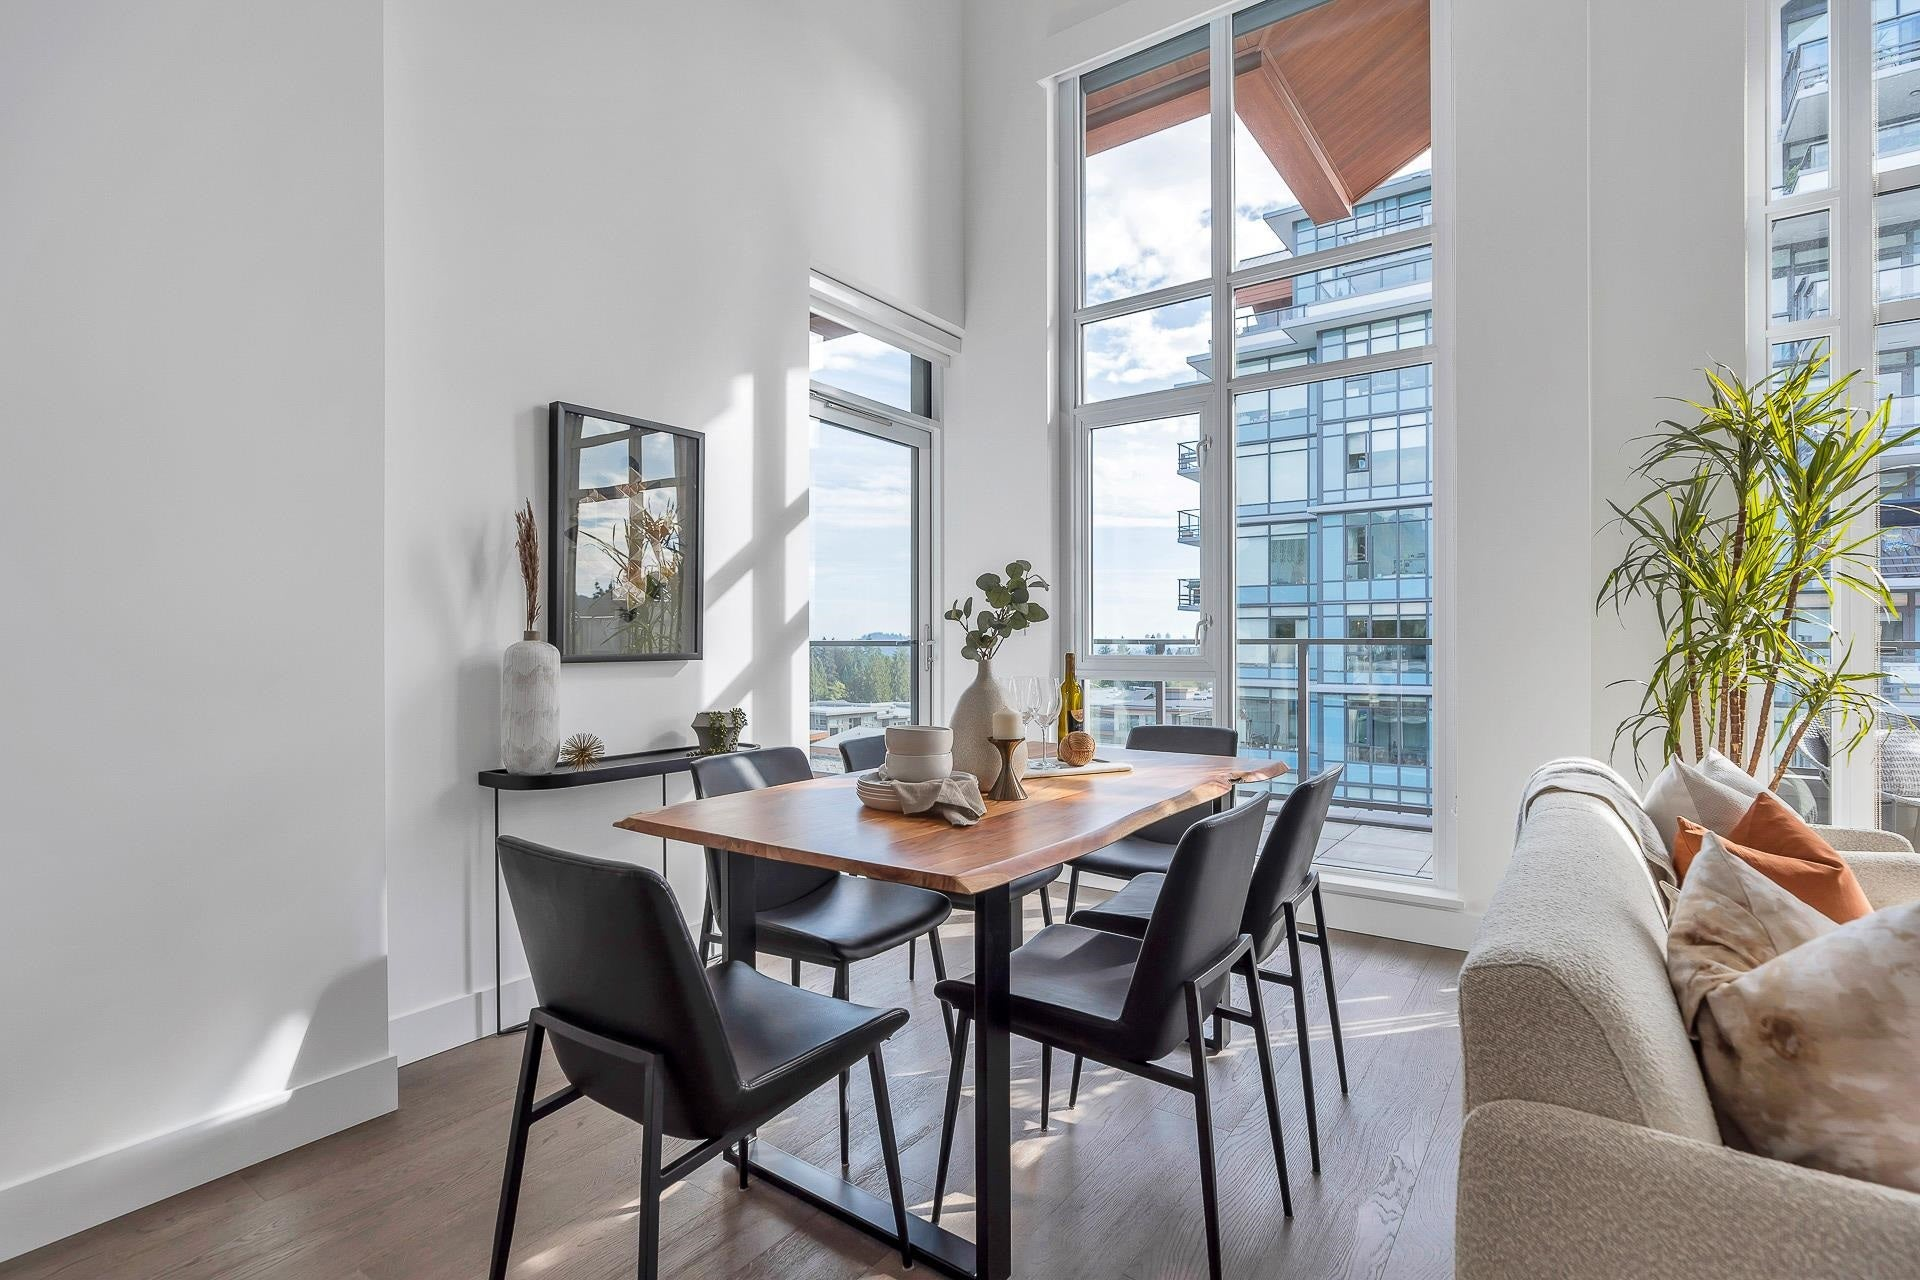 702 2780 VALLEY CENTRE AVENUE - Lynn Valley Apartment/Condo for sale, 3 Bedrooms (R2622279) - #6